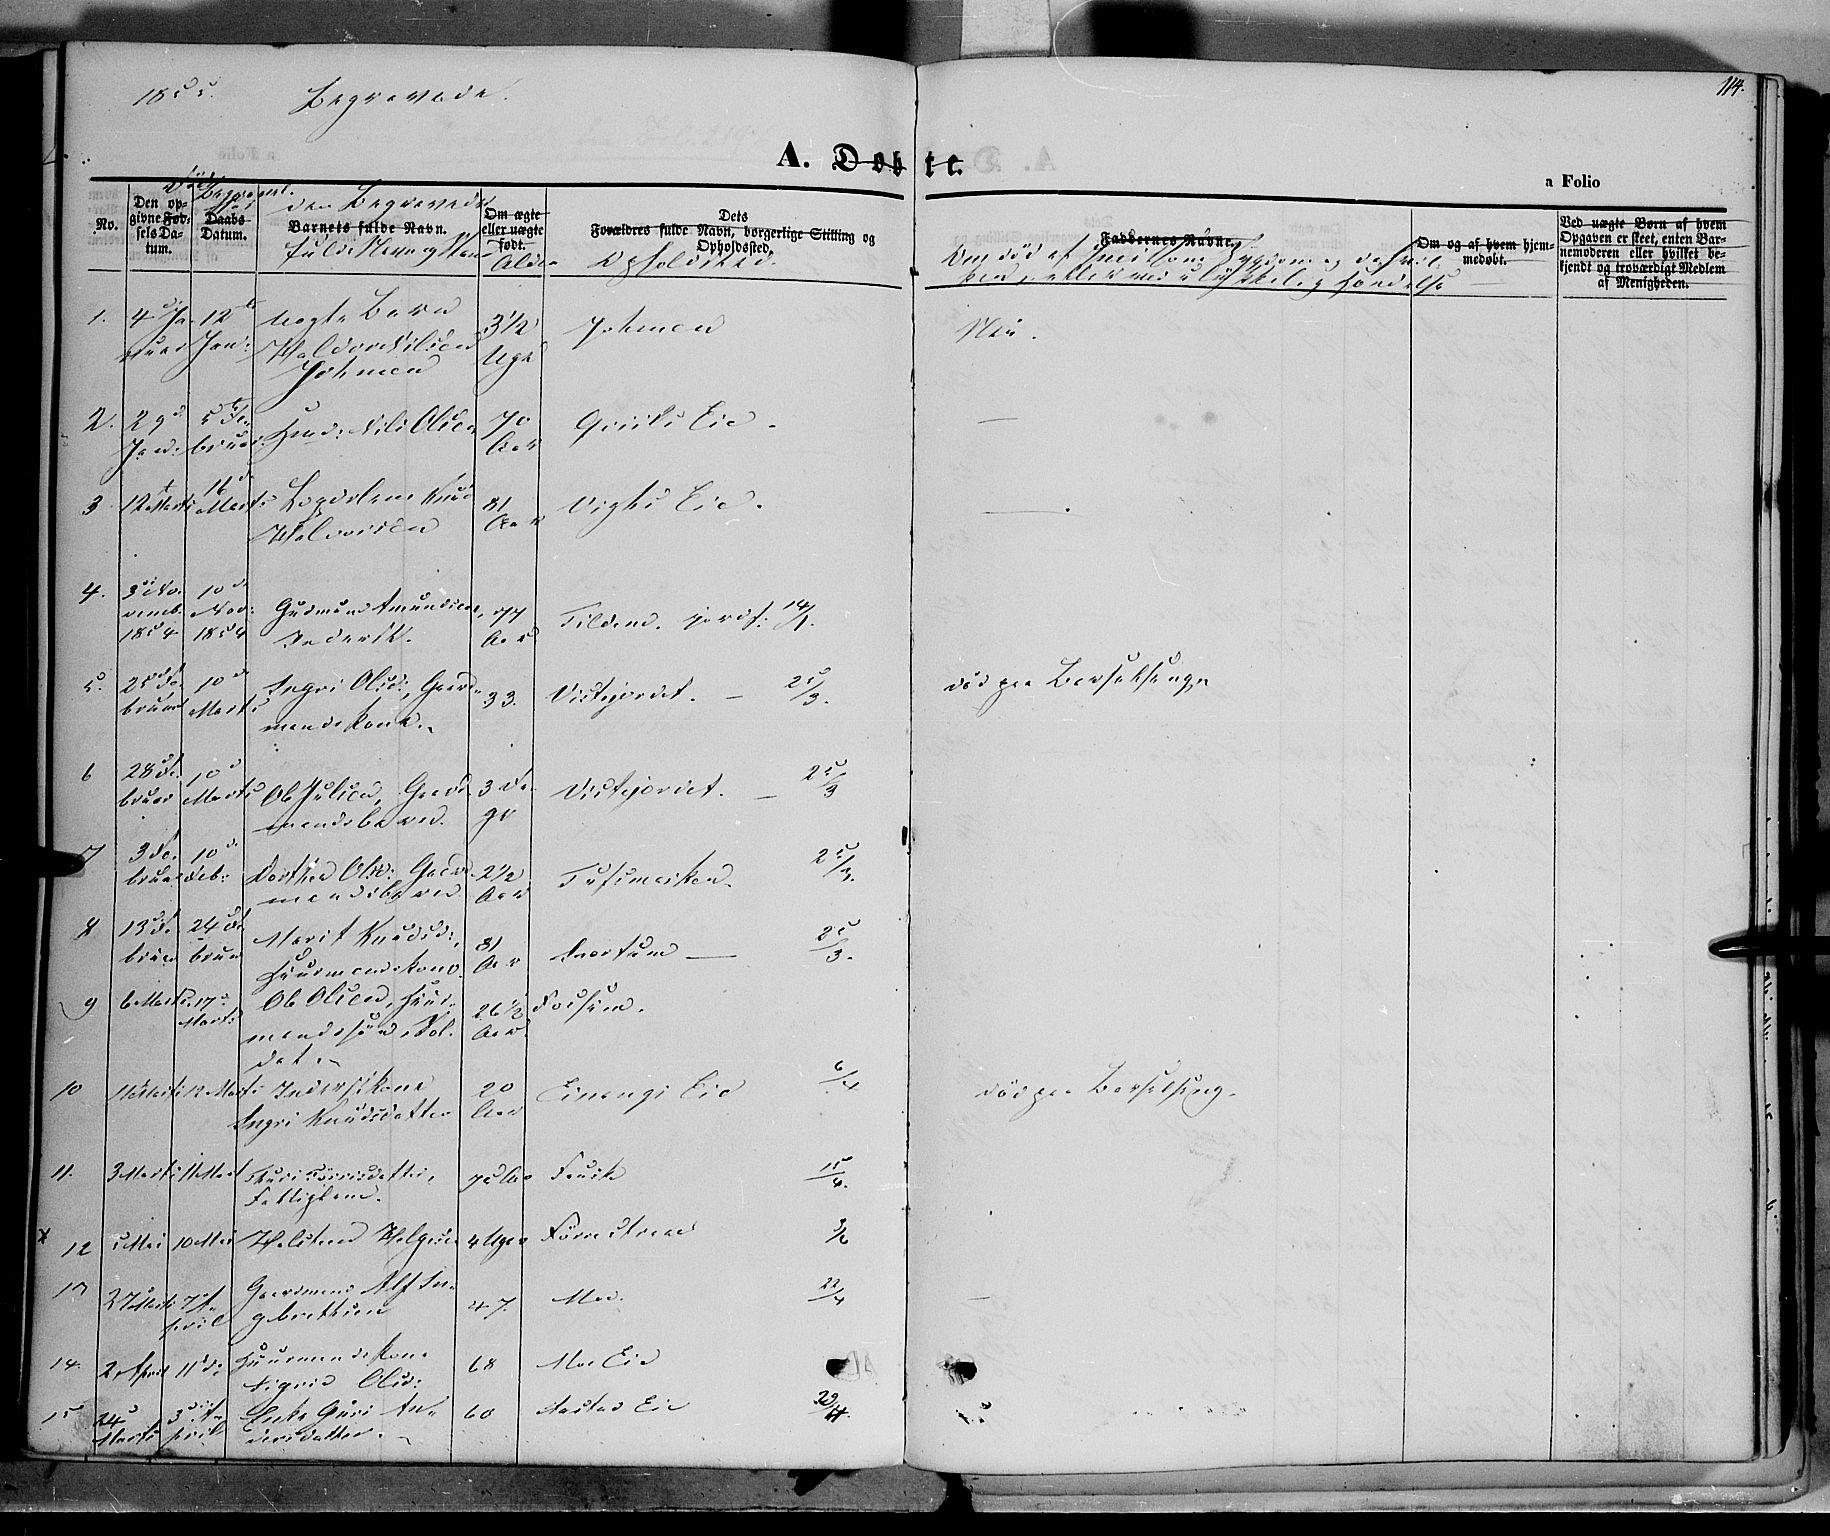 SAH, Vestre Slidre prestekontor, Ministerialbok nr. 1, 1844-1855, s. 114